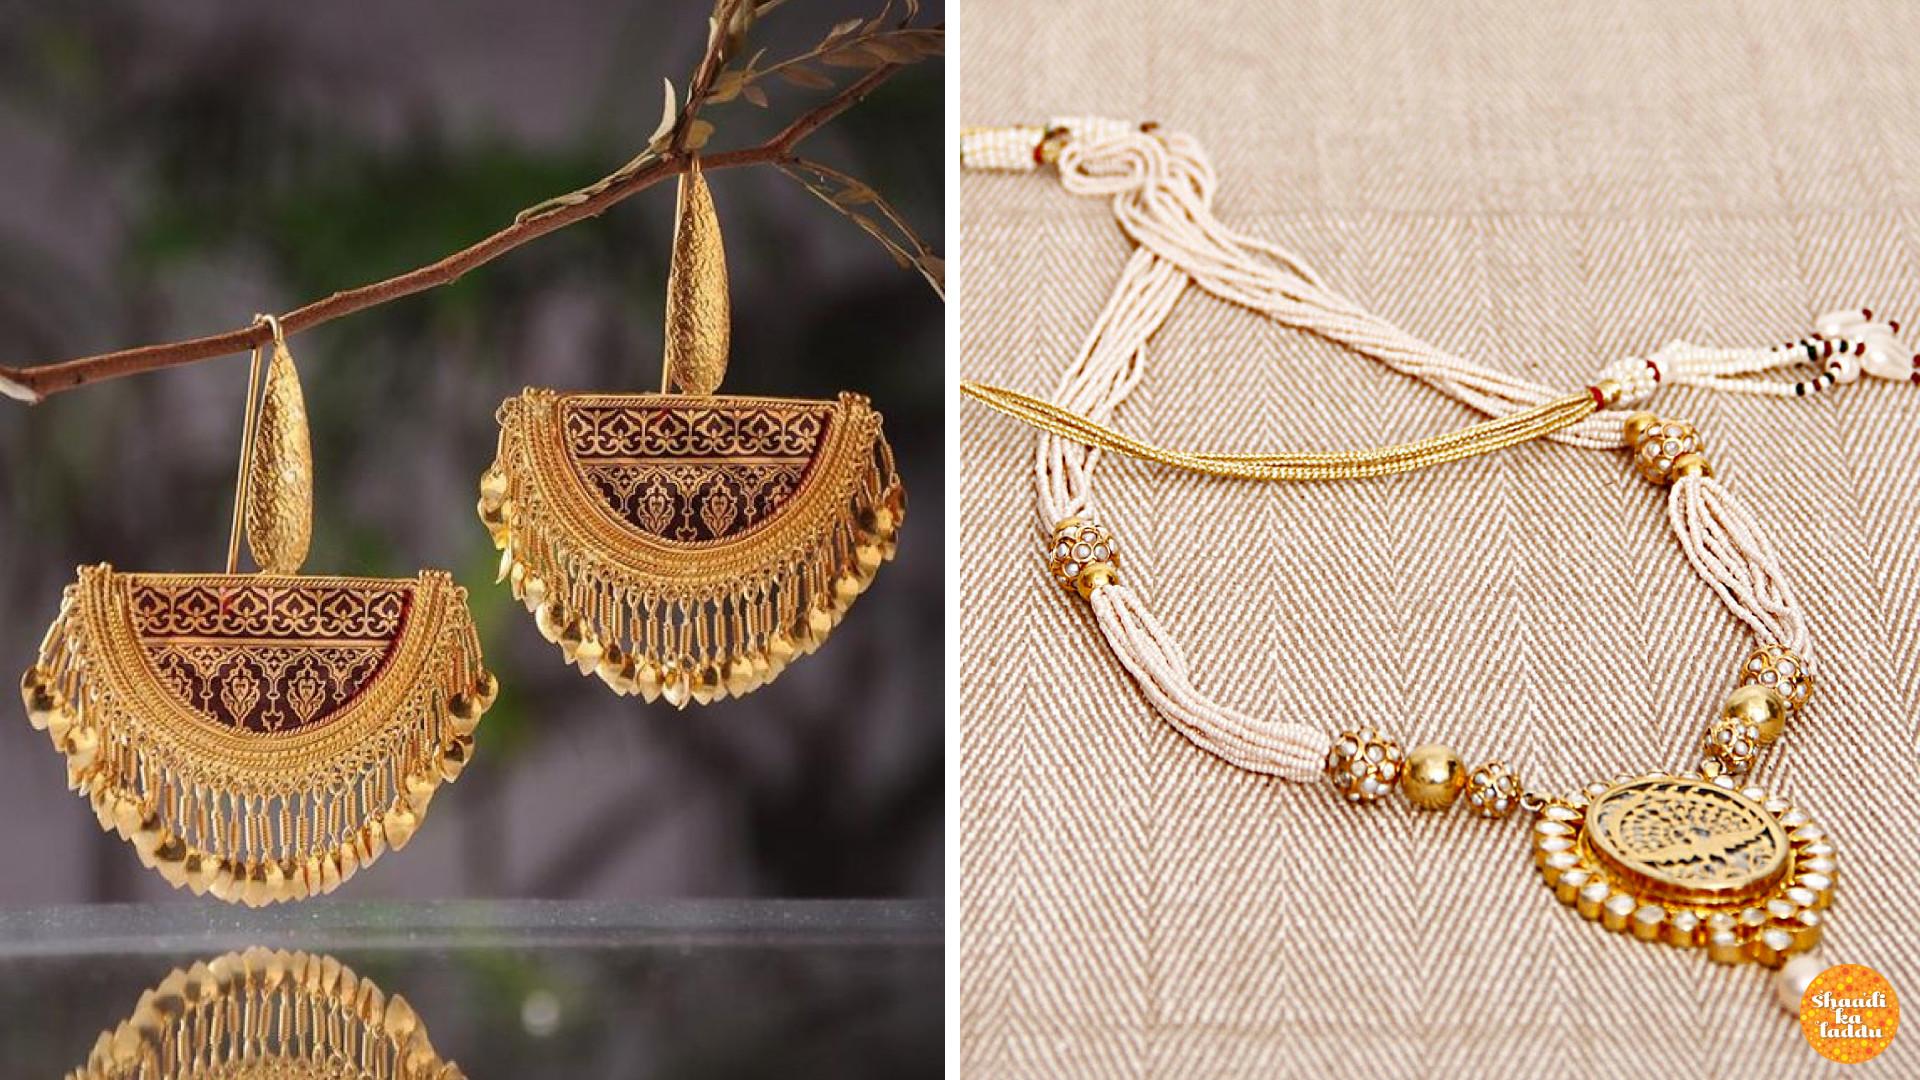 Gold embedded molten glass jewellery, Jaipur Thewa artistic jewellery